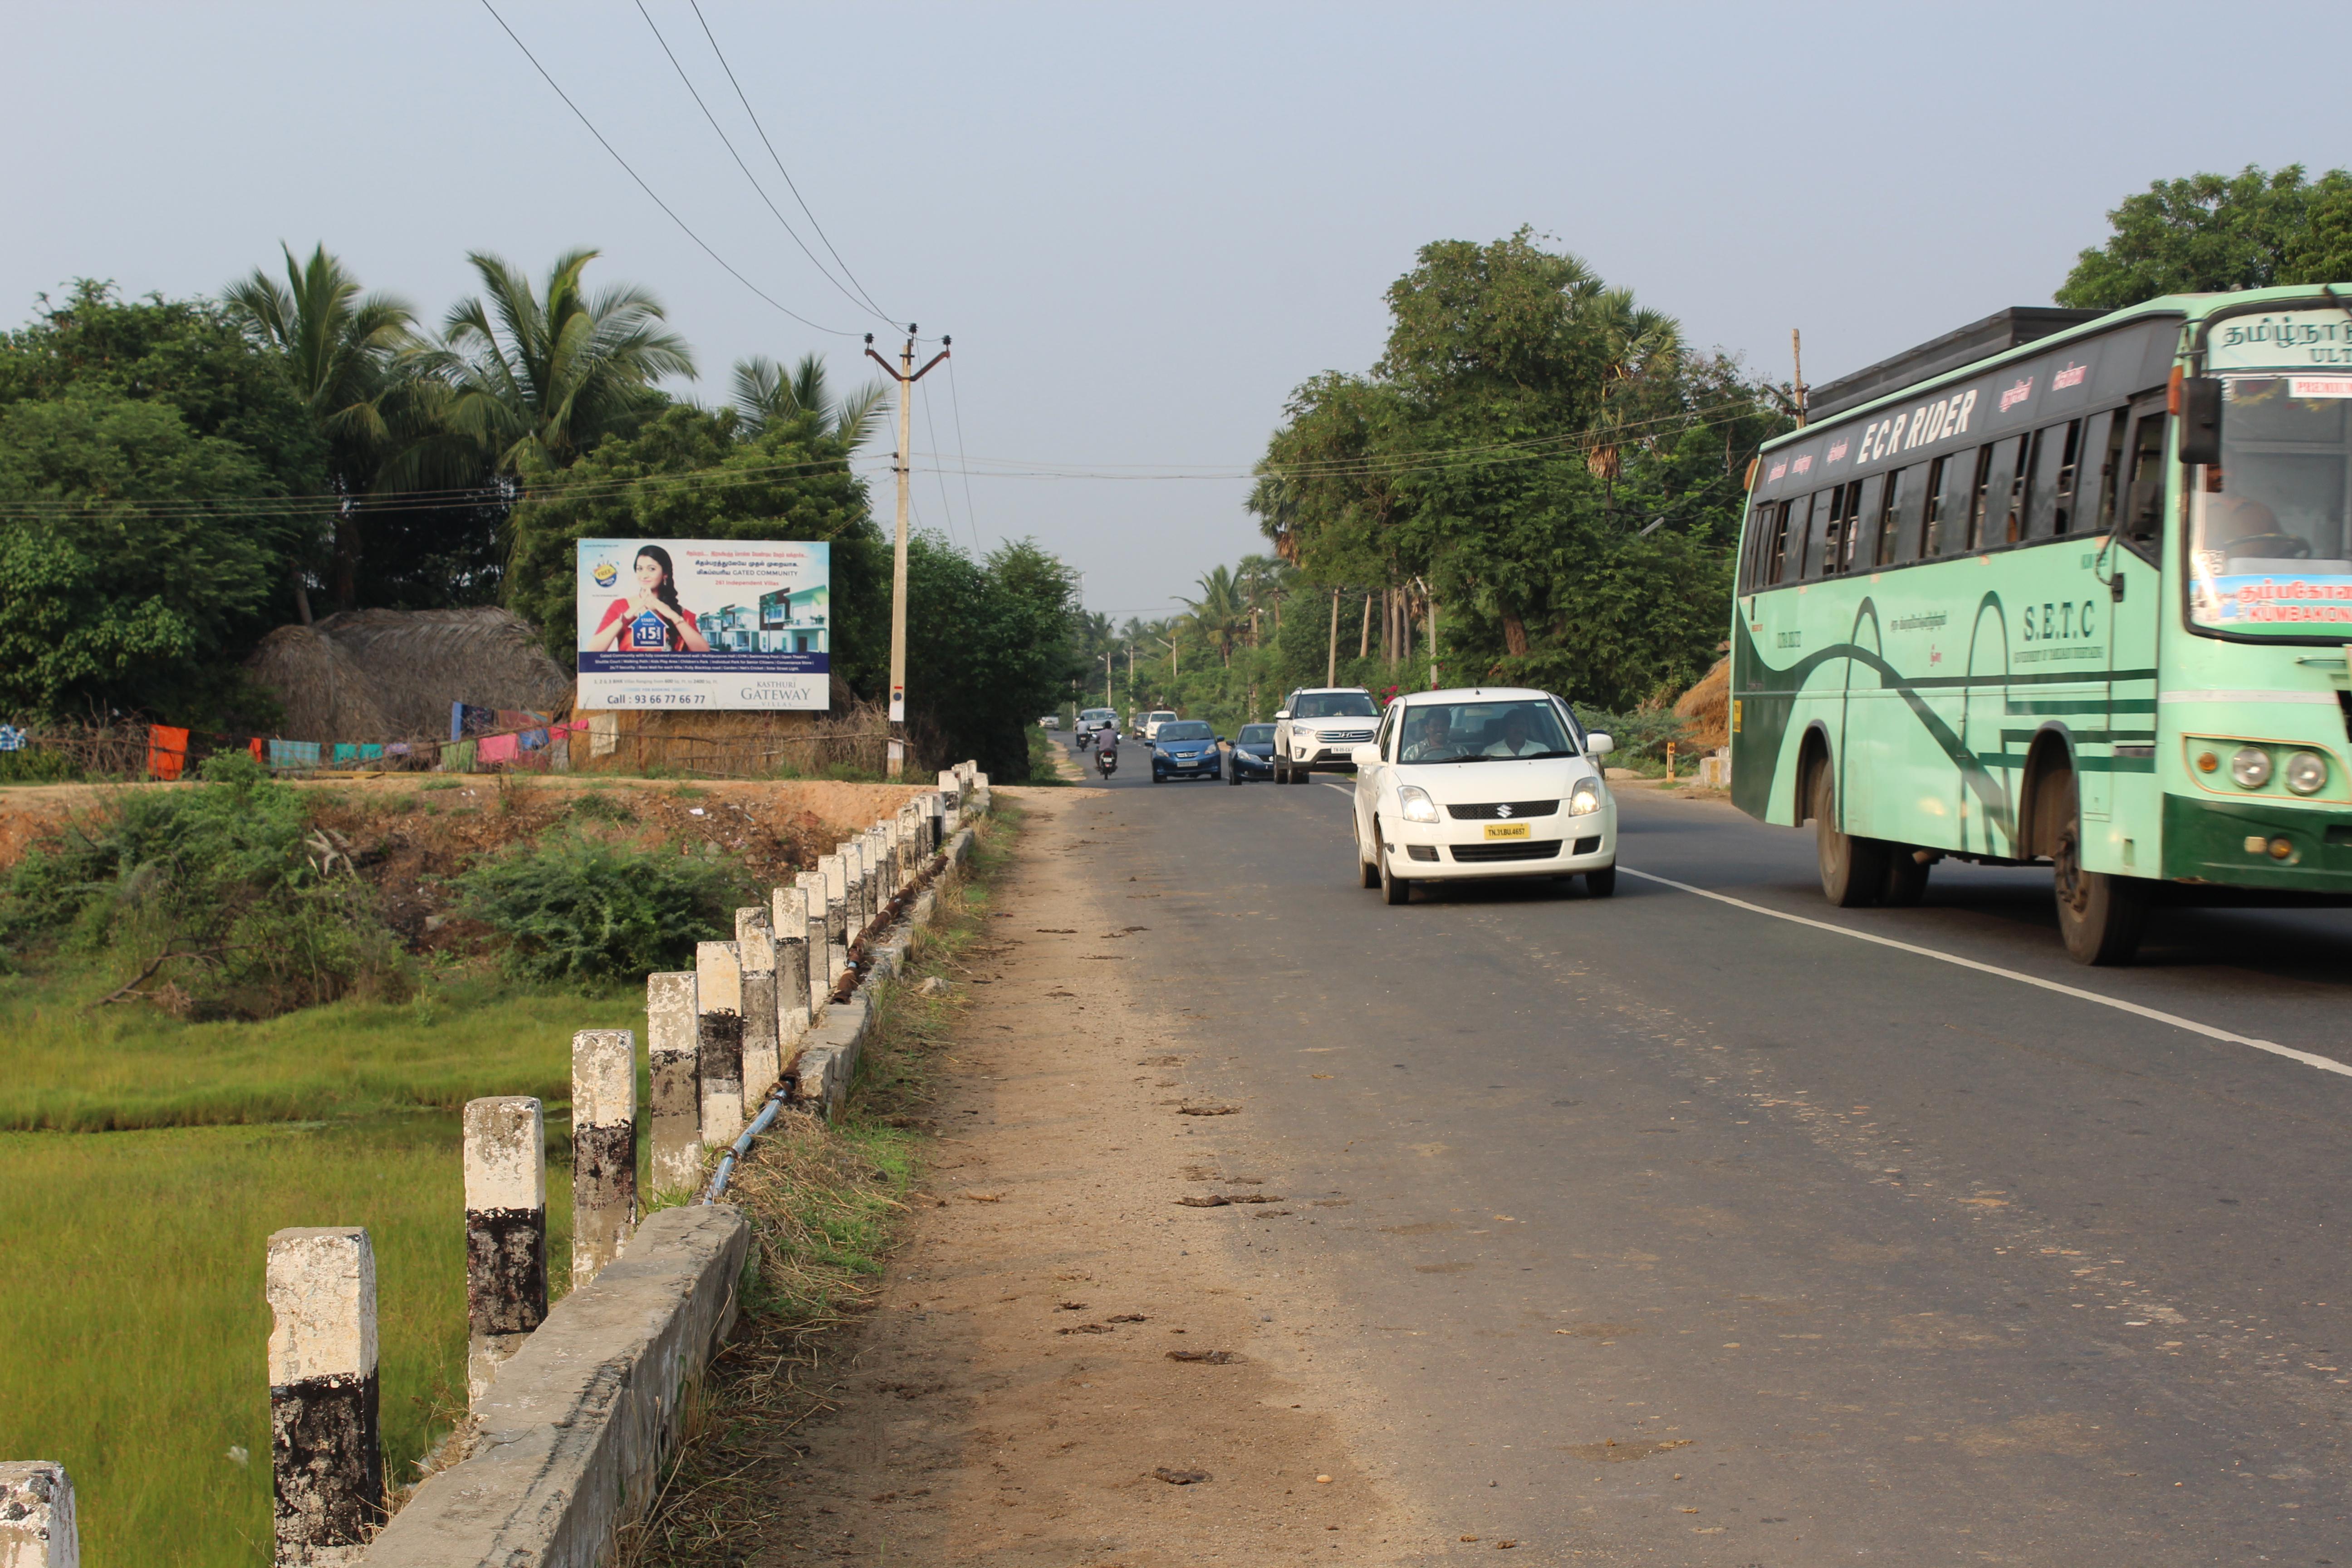 Child Cud Karuvadikuppam, Cuddalore